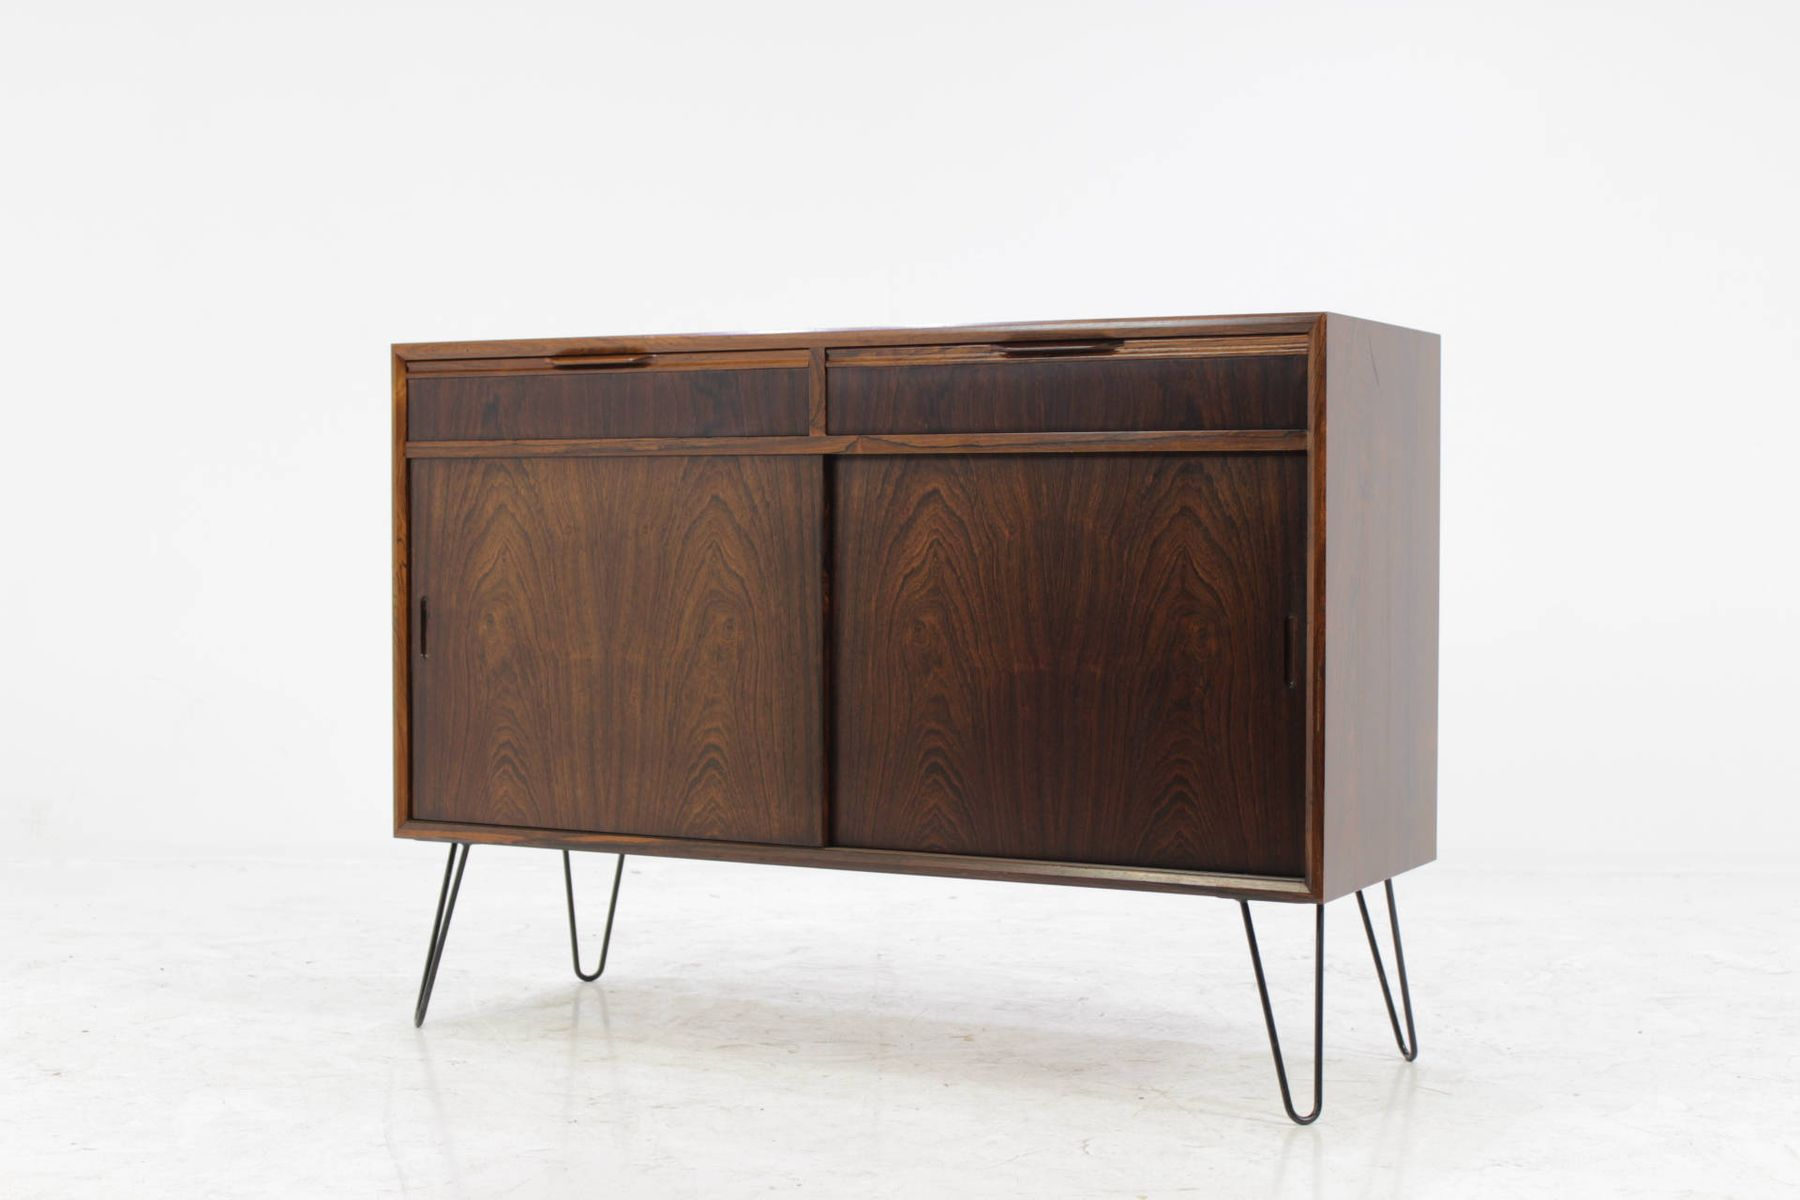 upcycled danish palisander sideboard 1960s for sale at pamono. Black Bedroom Furniture Sets. Home Design Ideas